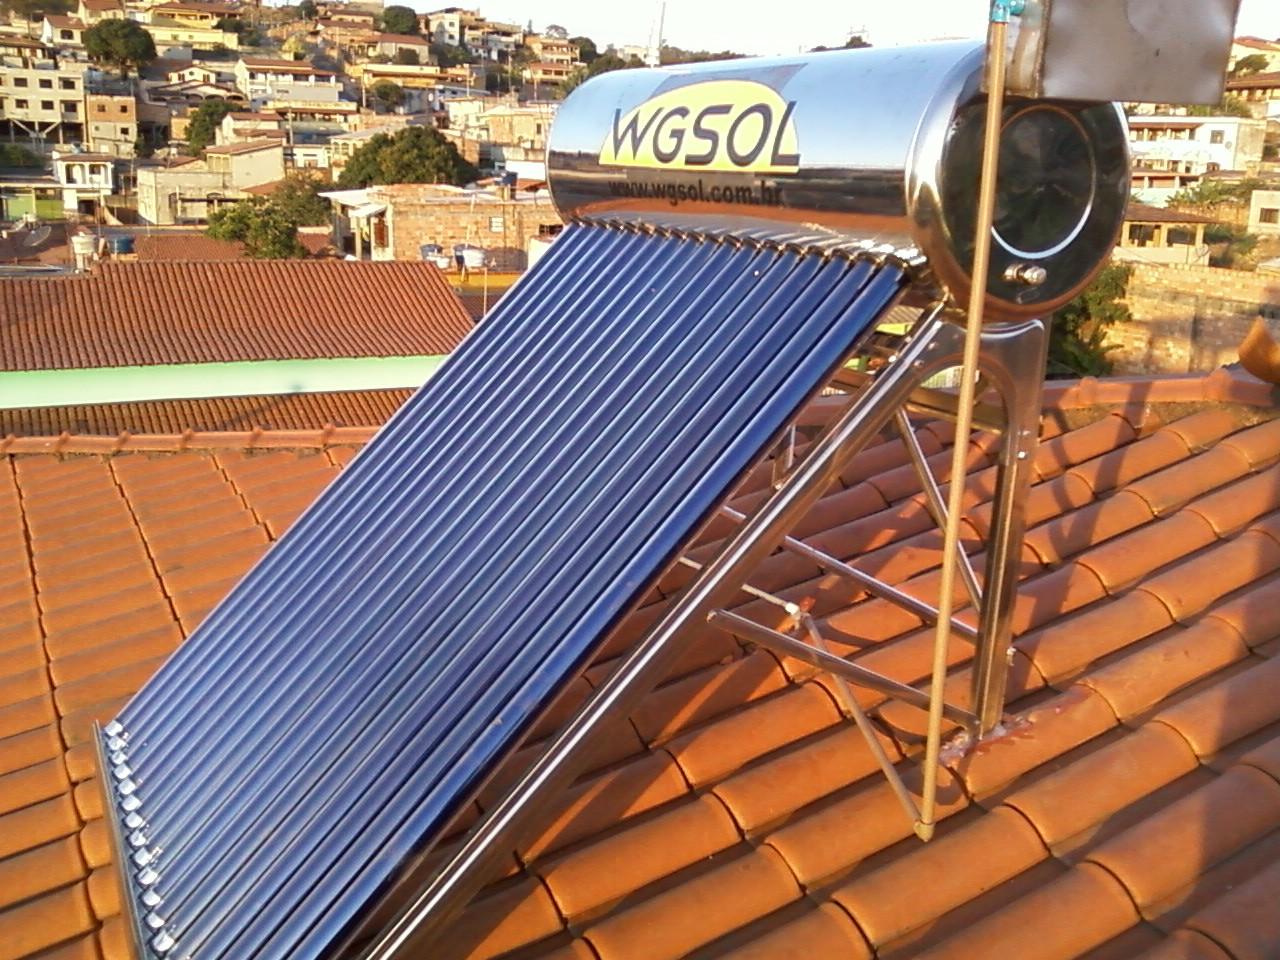 Aquecedor solar acoplado